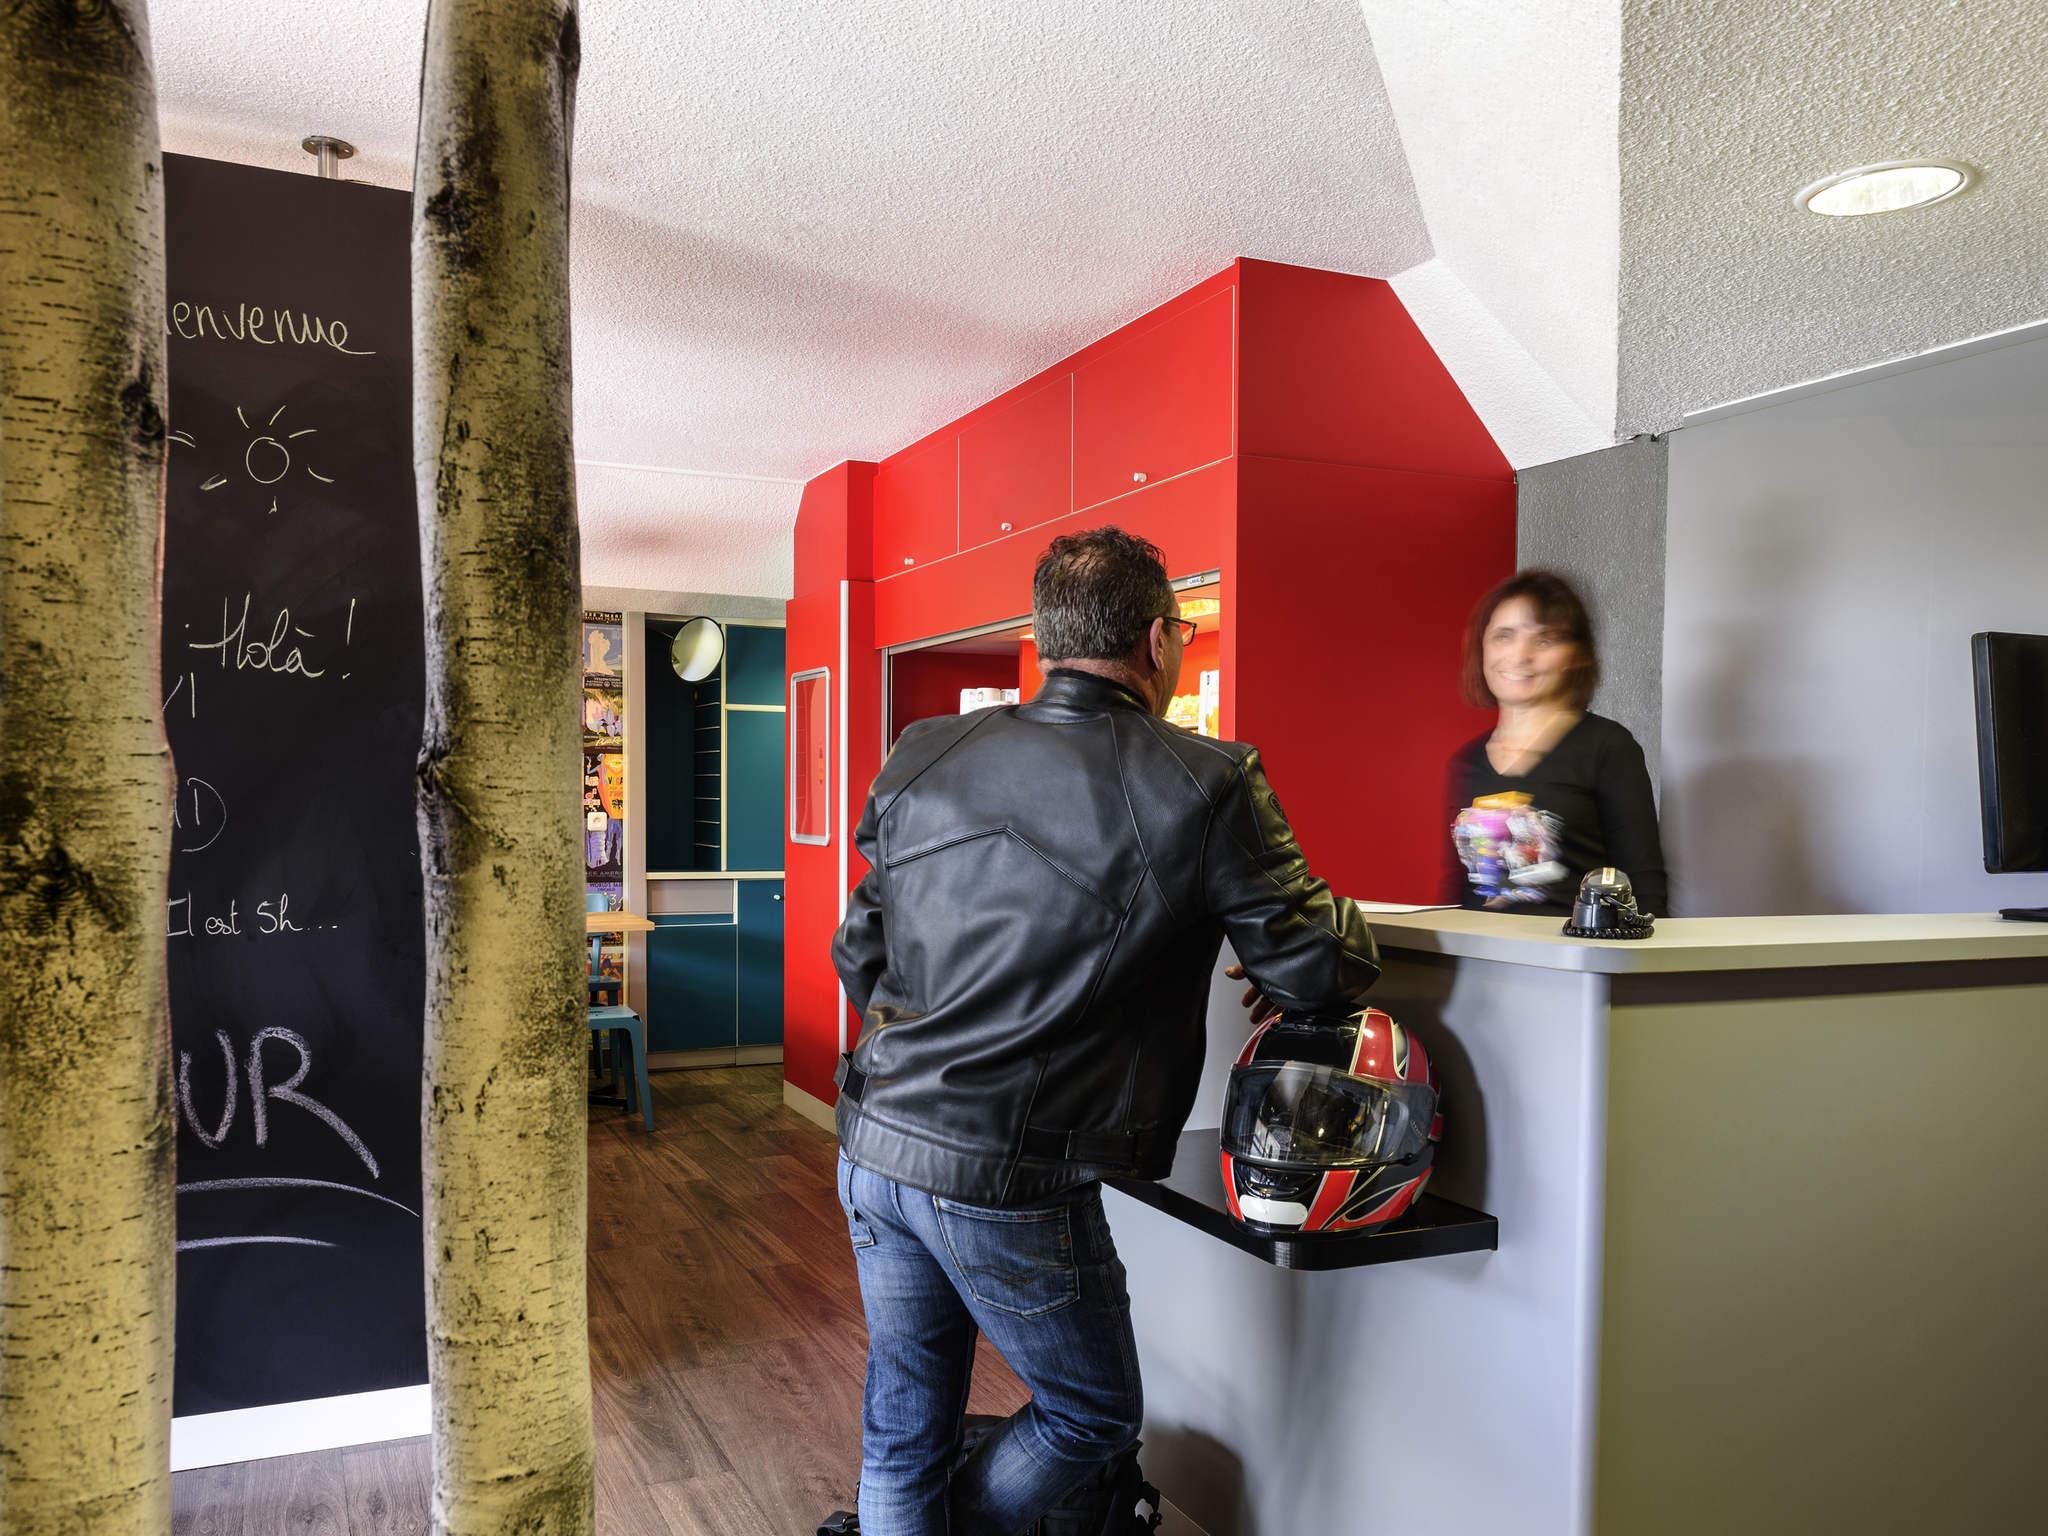 Hotel – hotelF1 Calais Coquelles